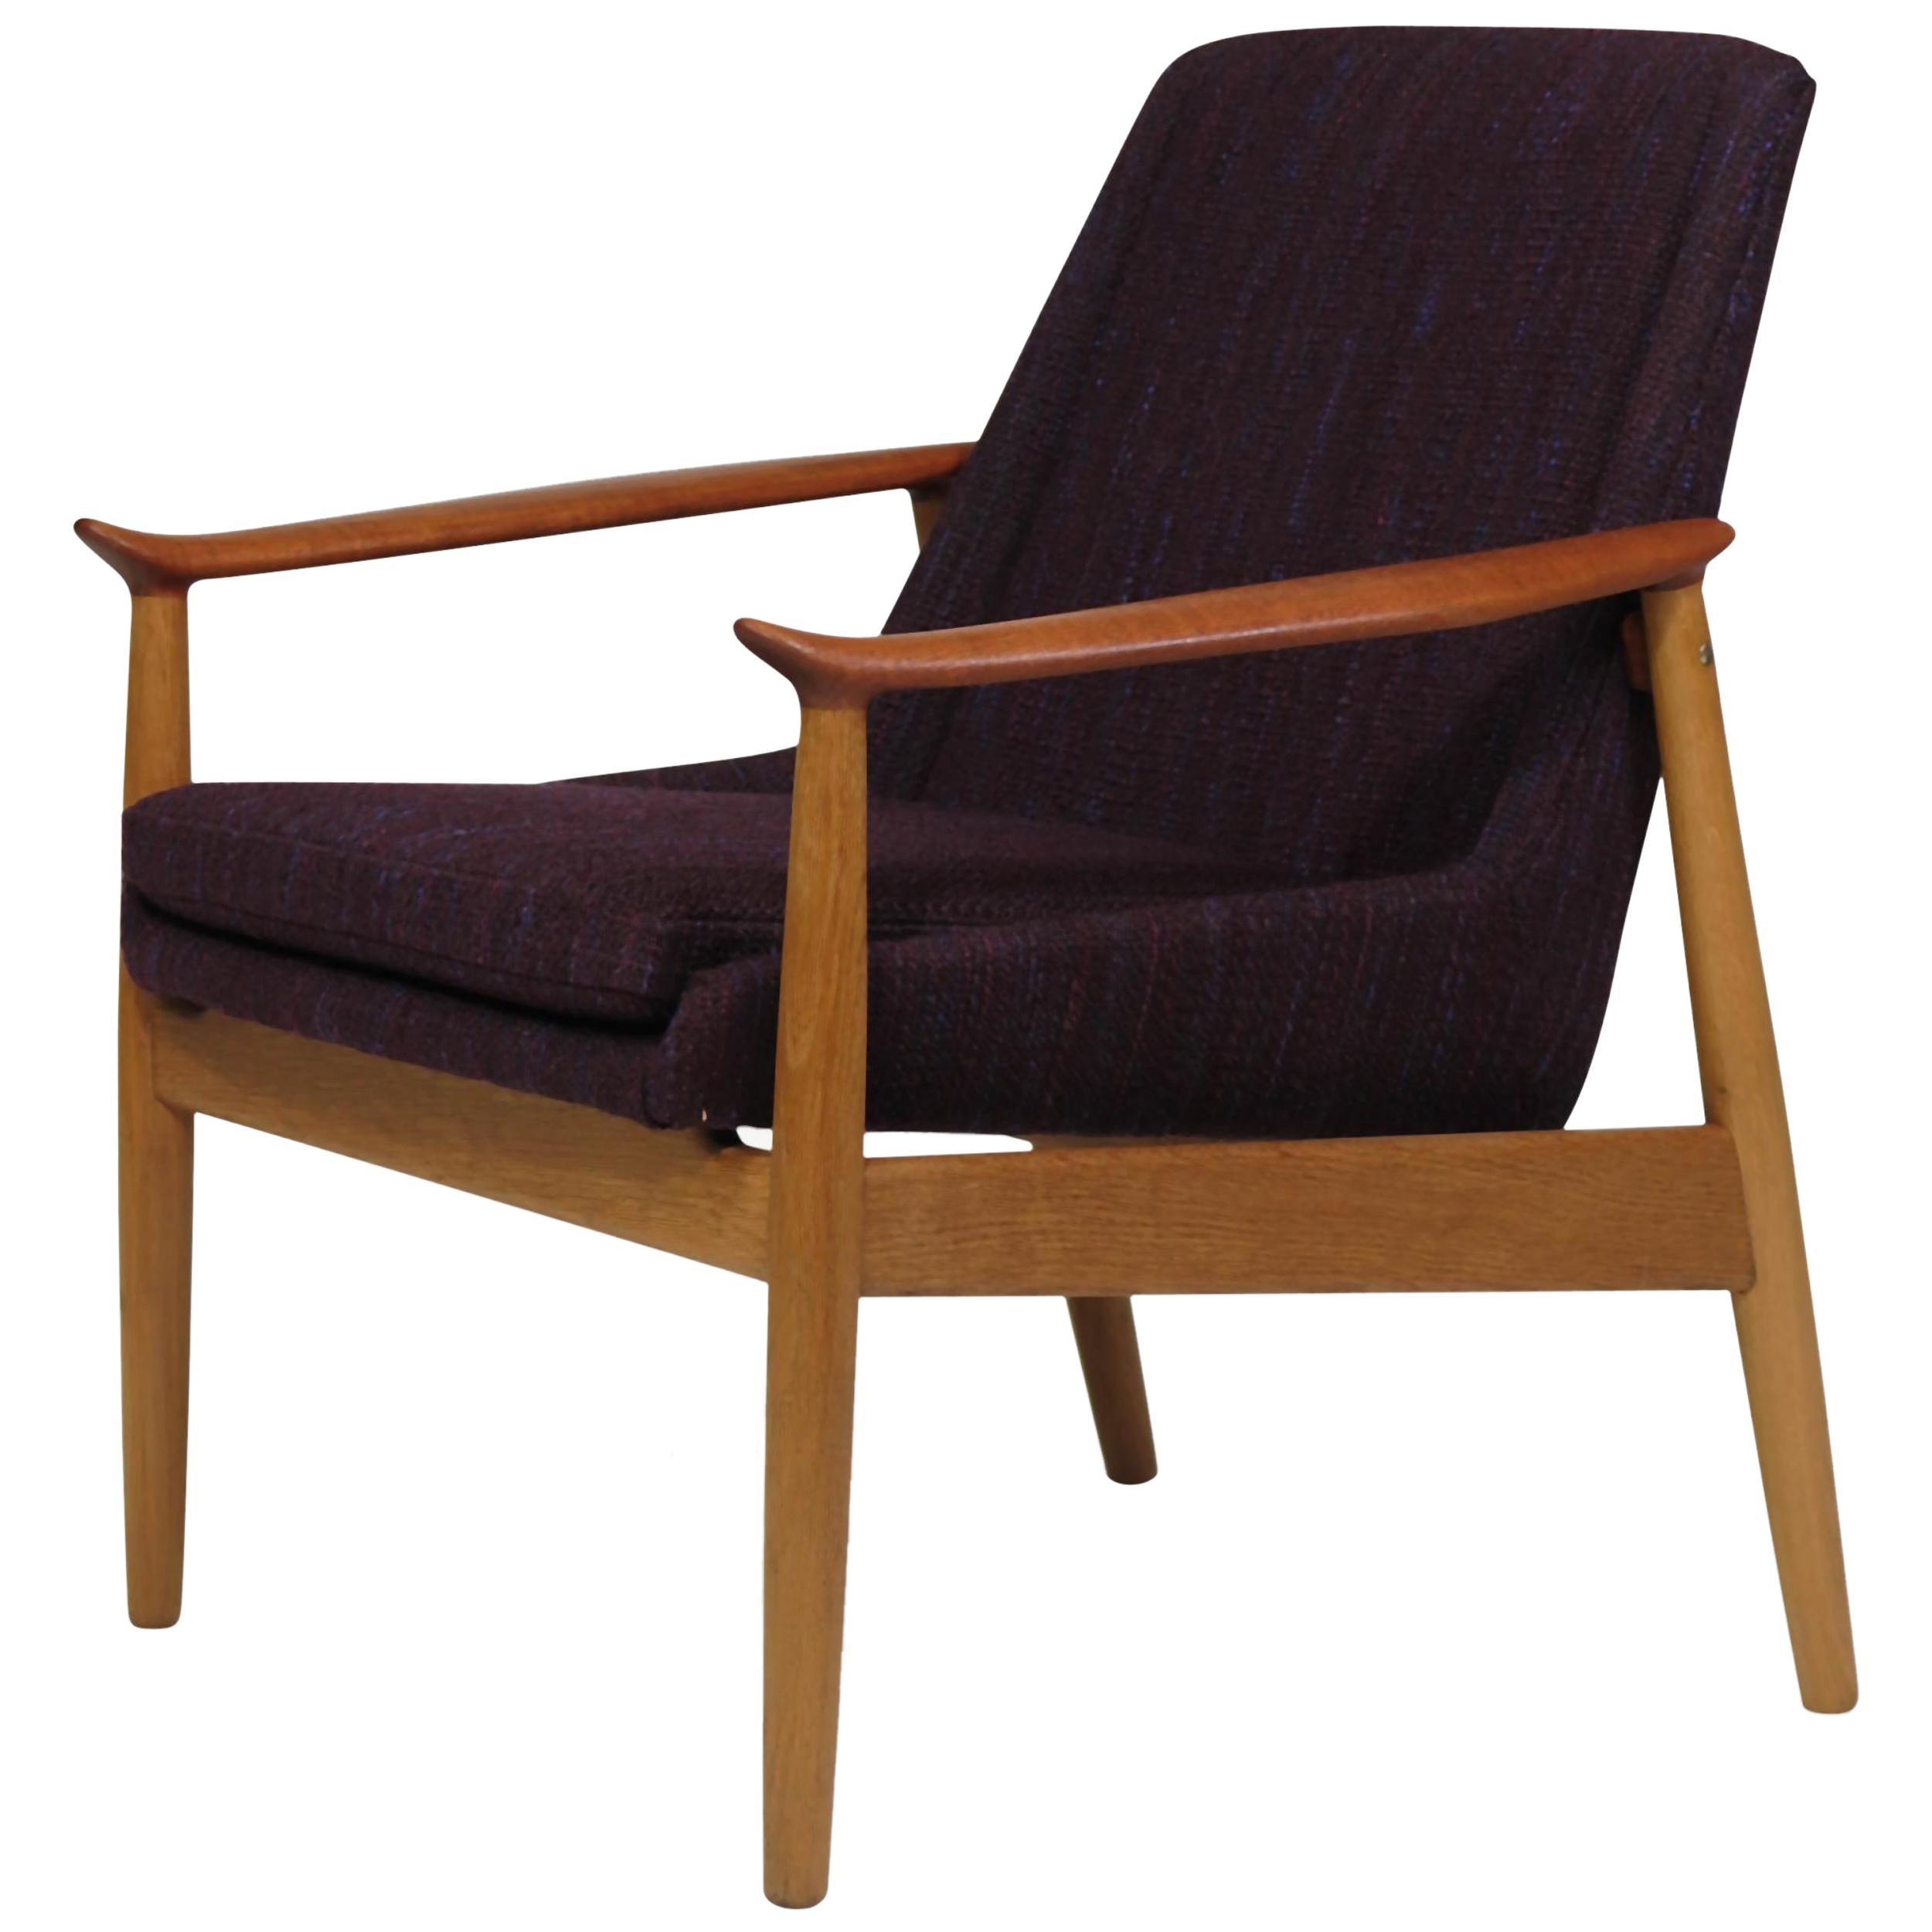 Arne Vodder Oak and Teak Lounge Chair